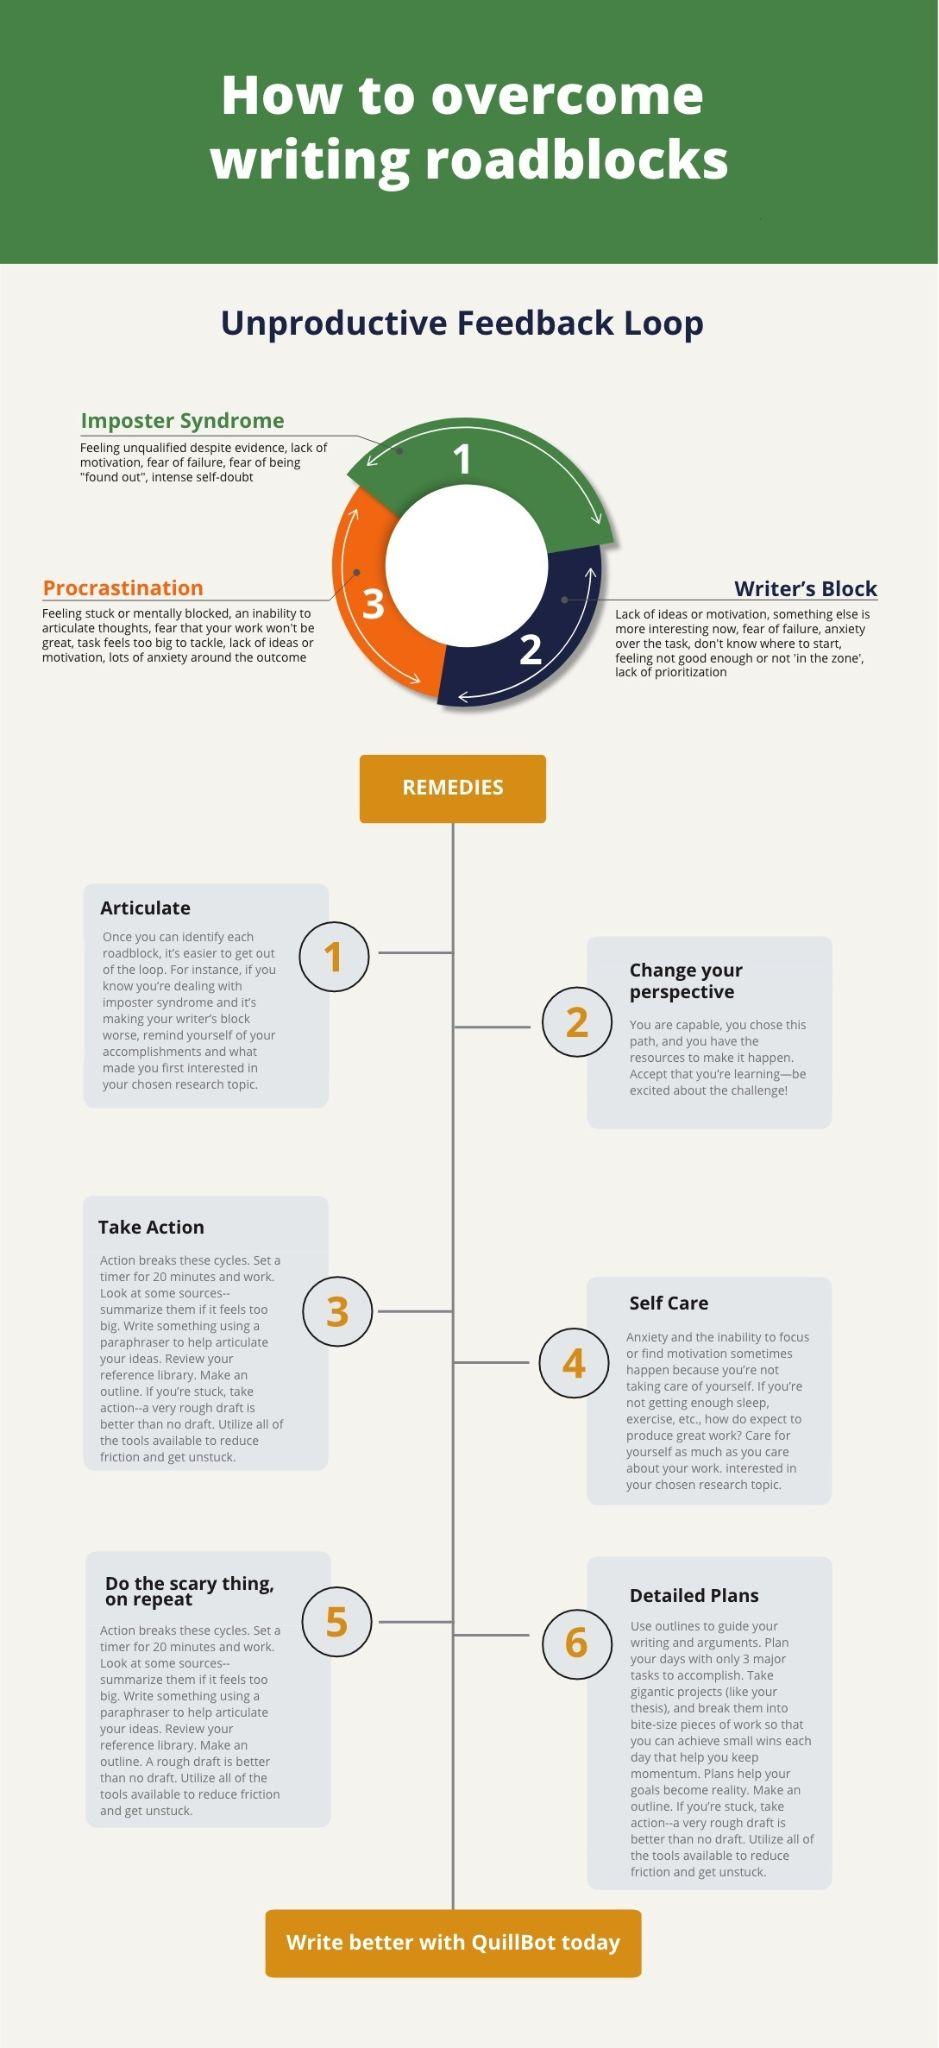 How to overcome writing roadblocks graphic.